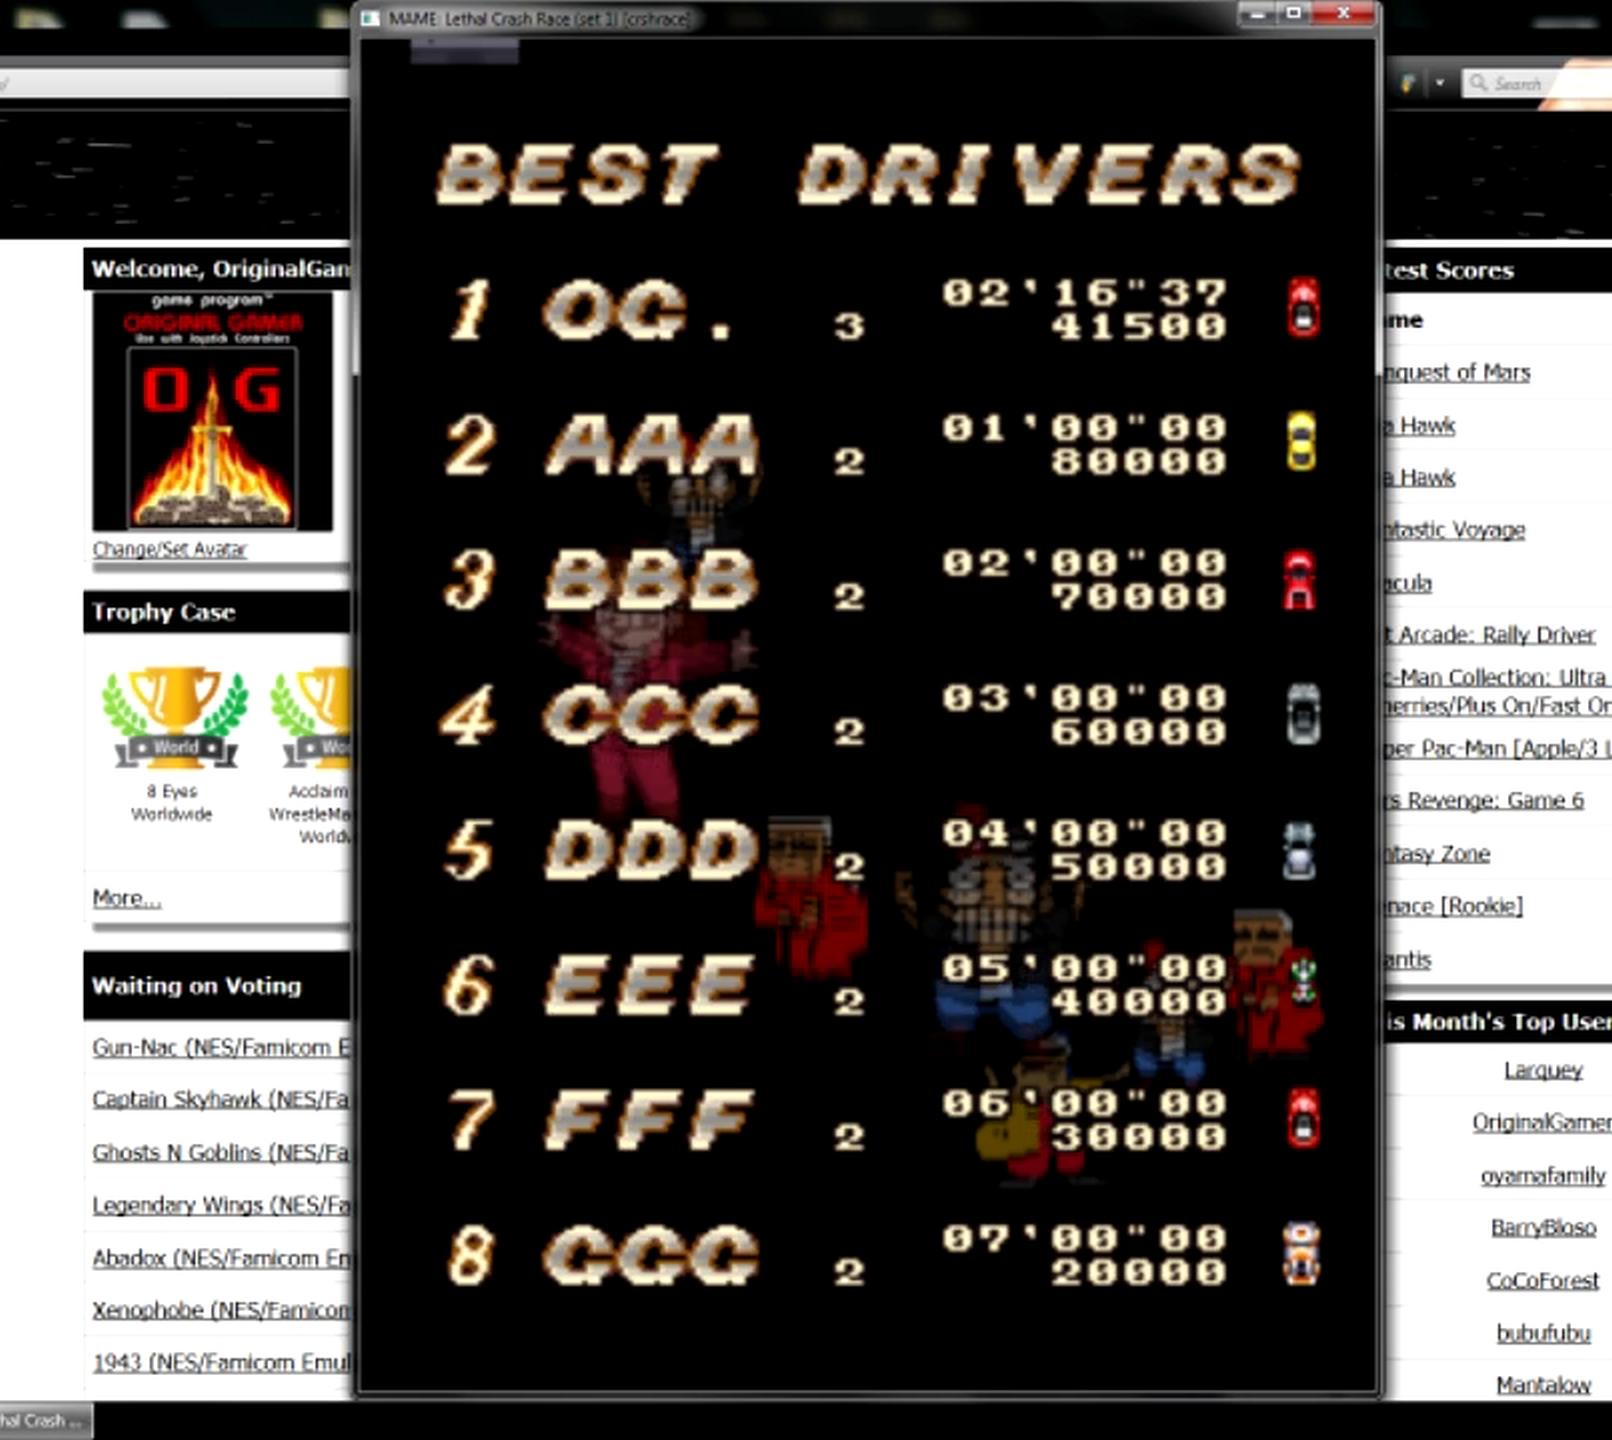 OriginalGamer: Lethal Crash Race [crshrace] (Arcade Emulated / M.A.M.E.) 41,500 points on 2015-05-30 23:42:58